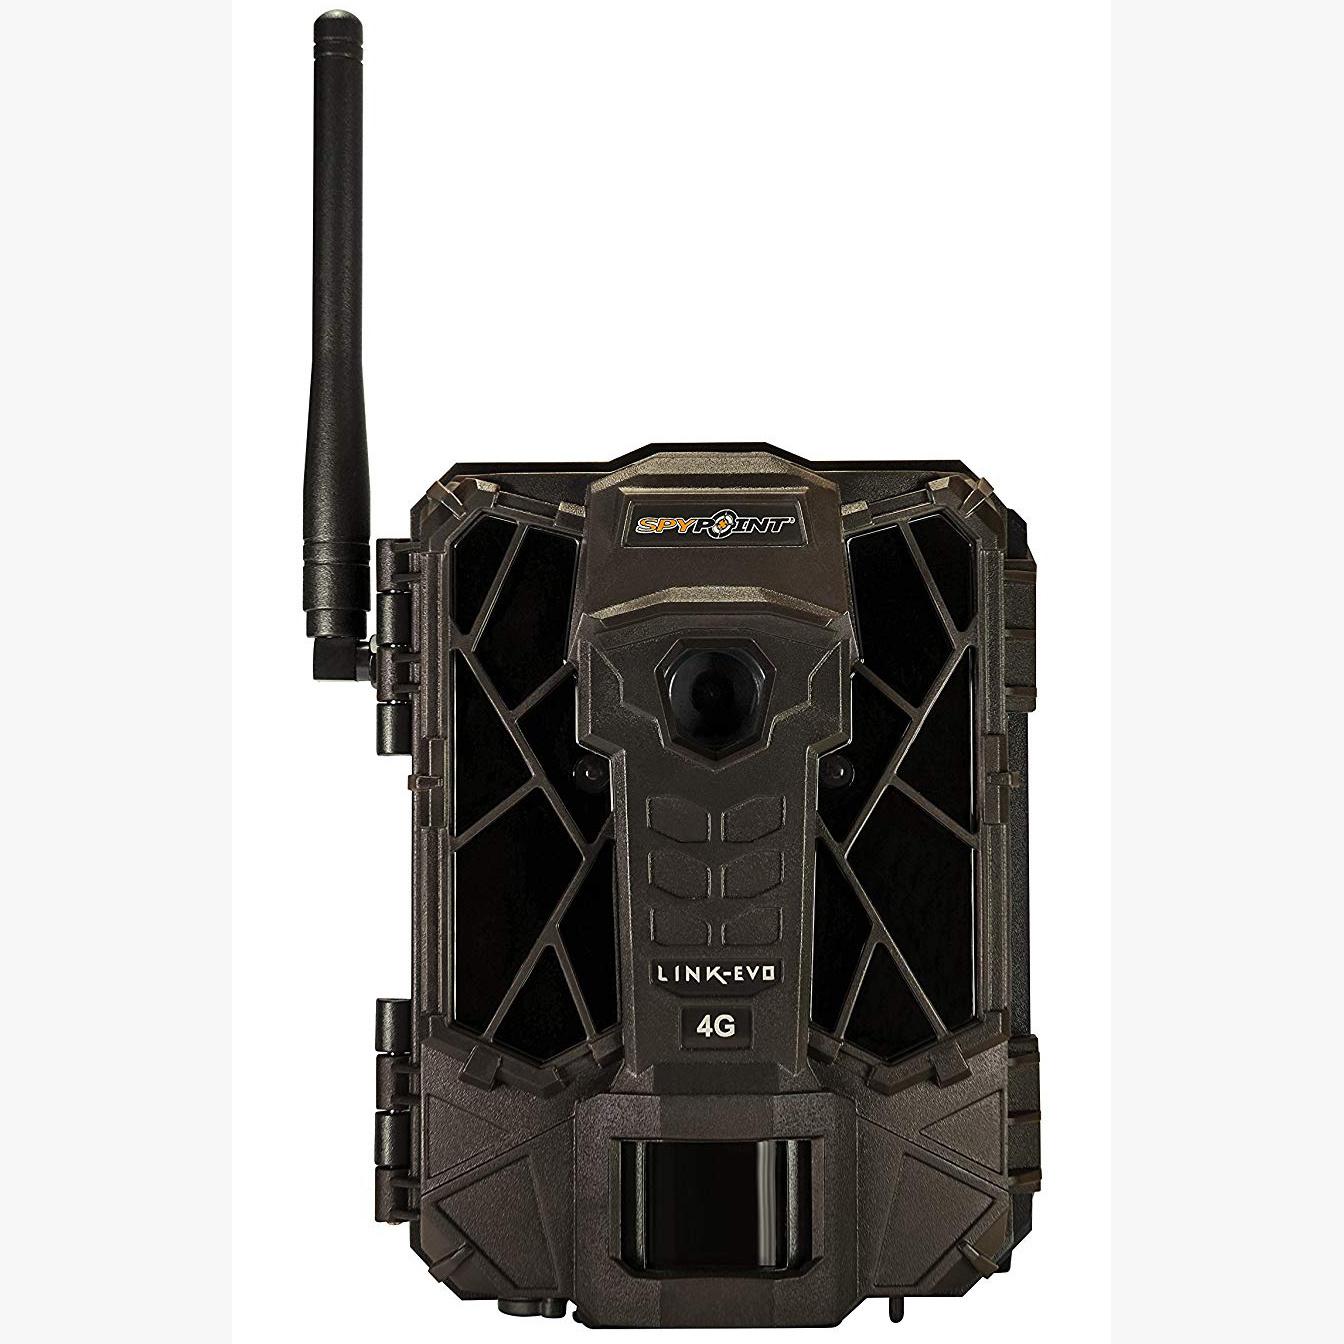 Spypoint Link-Evo Cellular Trail Camera